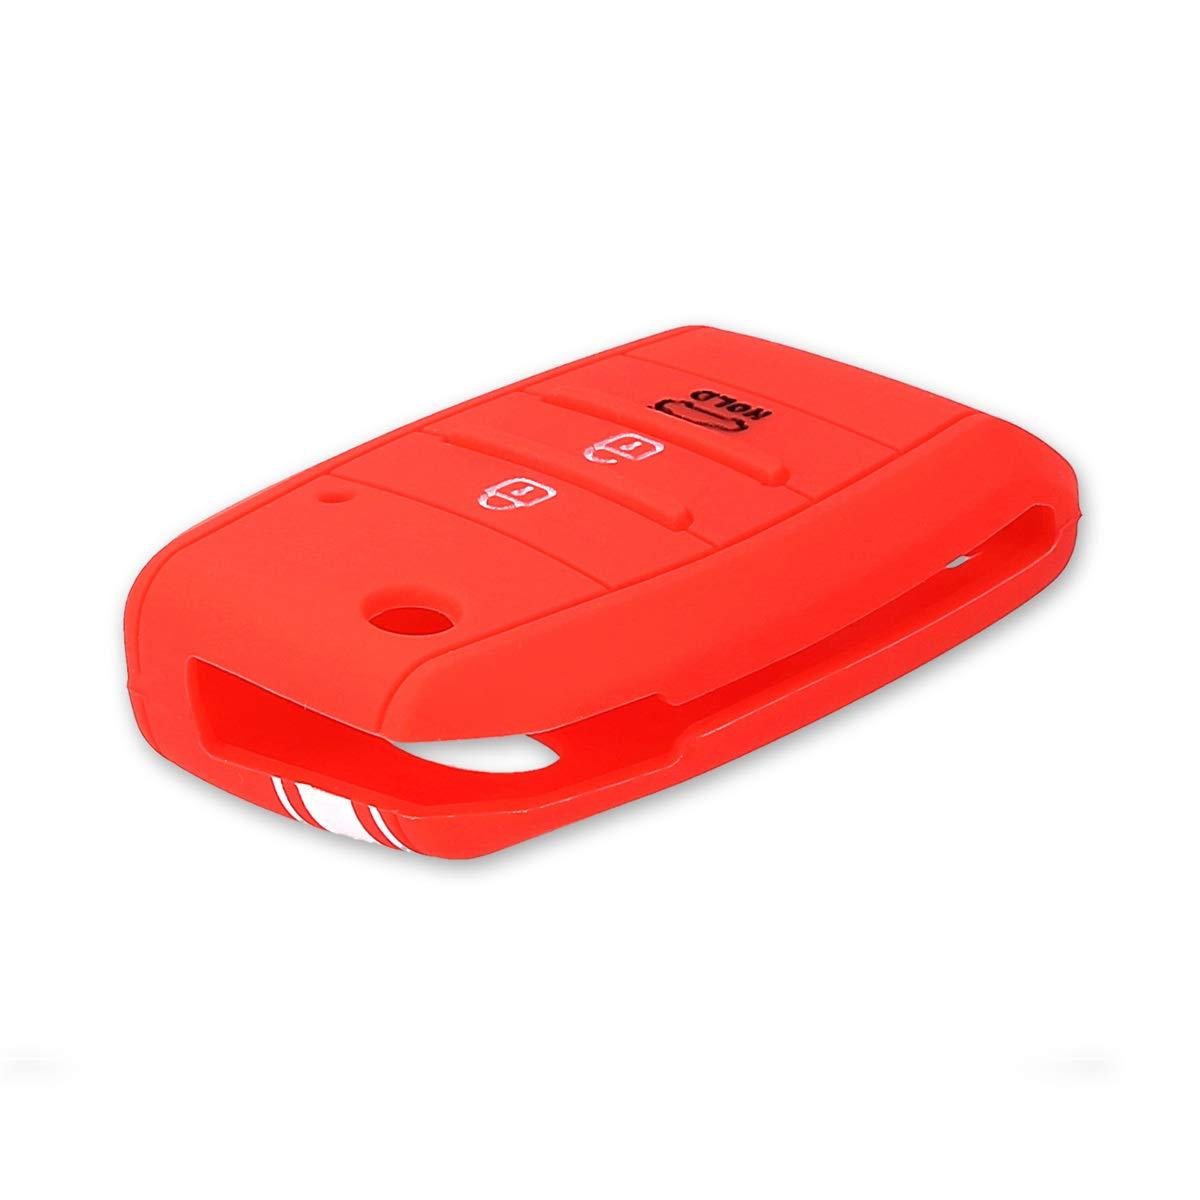 Silicone Protective Key Fob Cover for Kia 3-4 Button Car Key White//Dark Pink kwmobile Car Key Cover for Kia